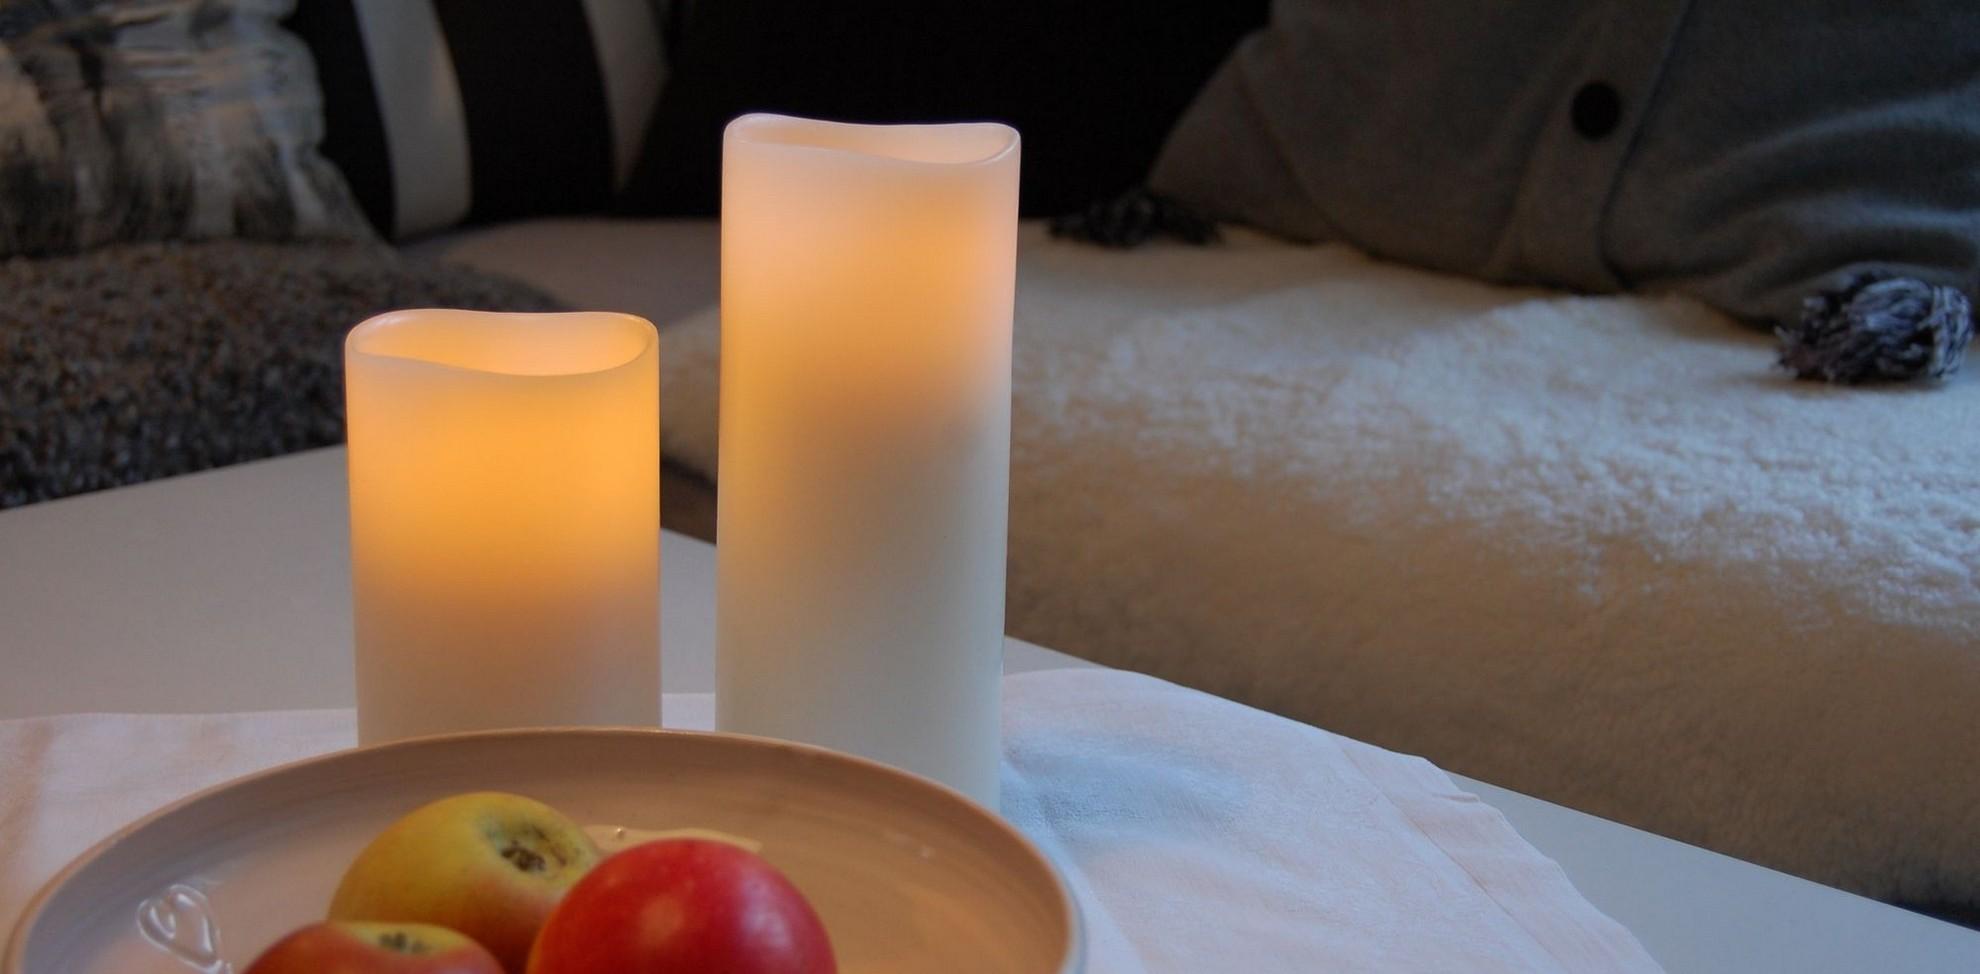 Amber LED Lights